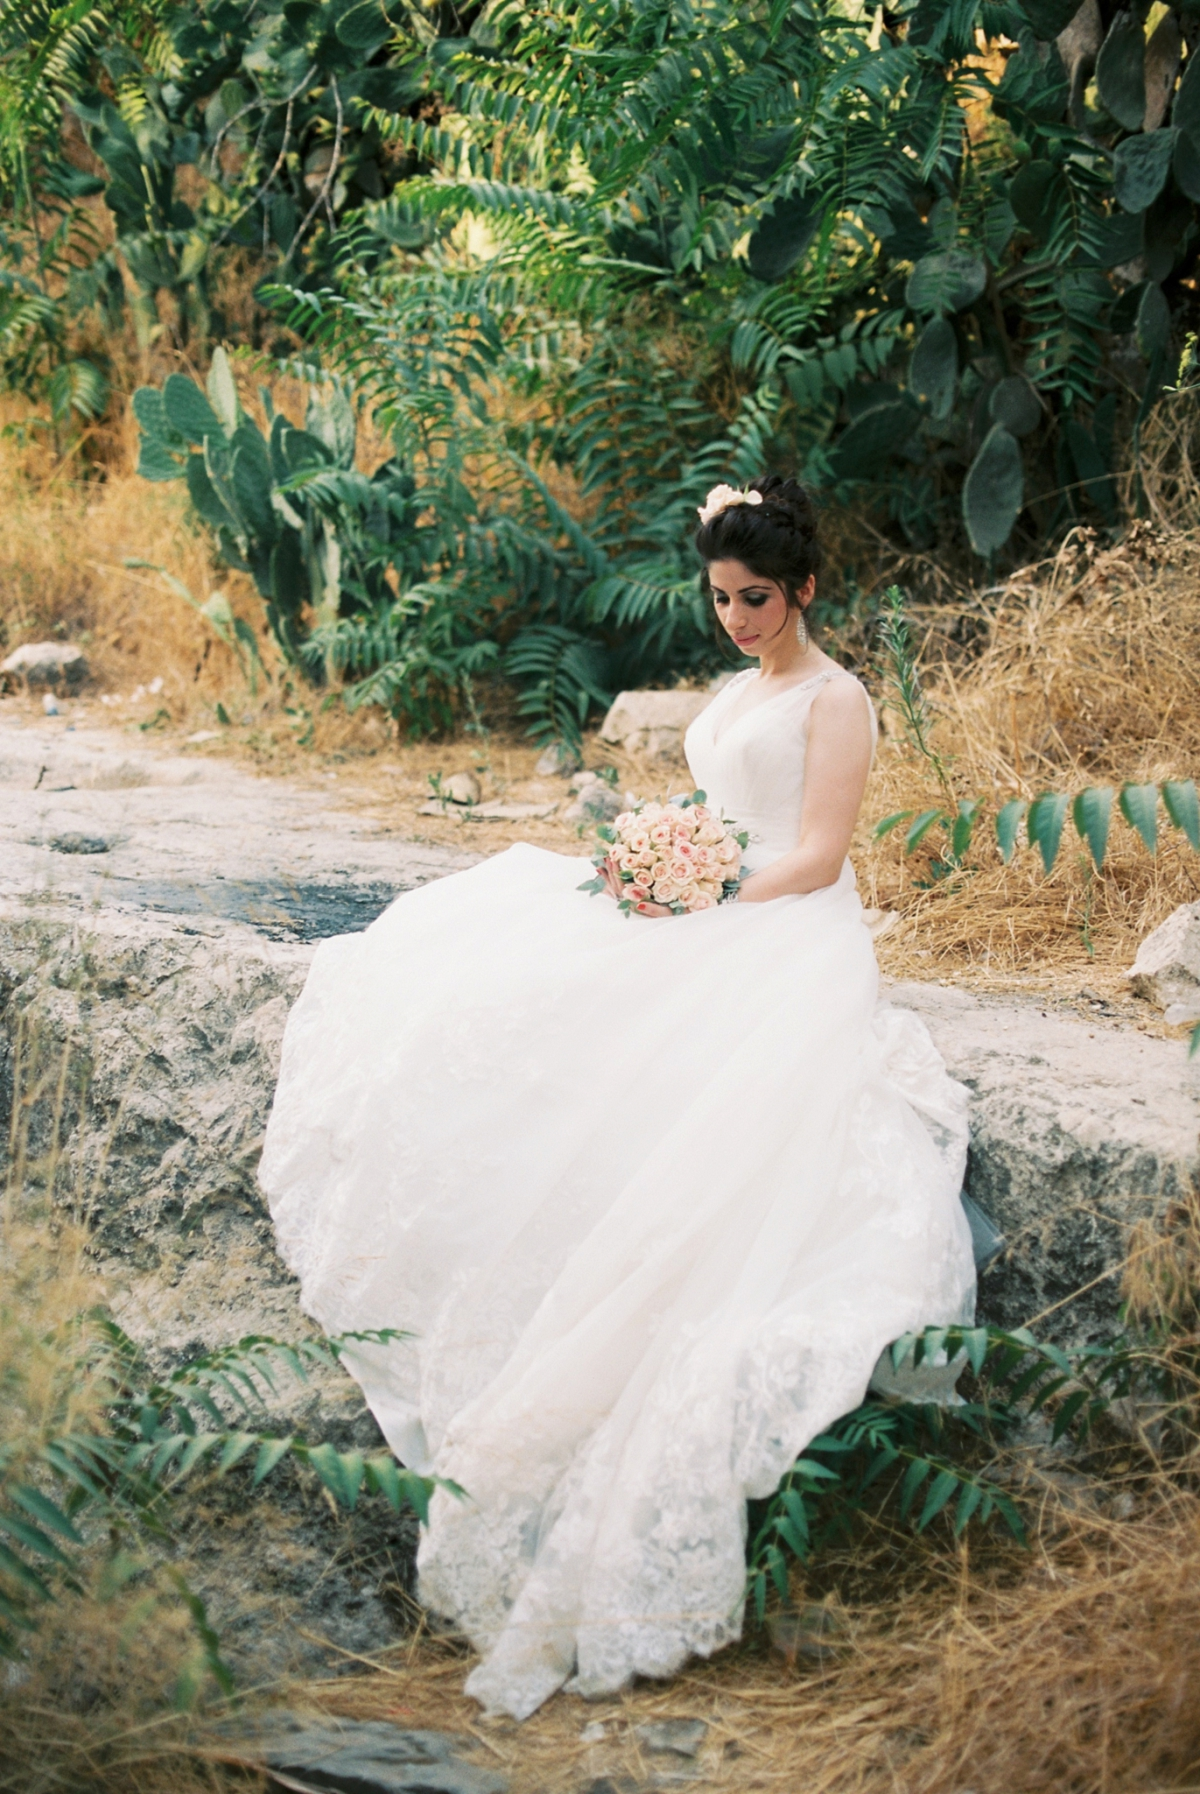 Lifta Bridal Portraits - Jerusalem Israel - Muna and Ali - Sigala Photography_0018